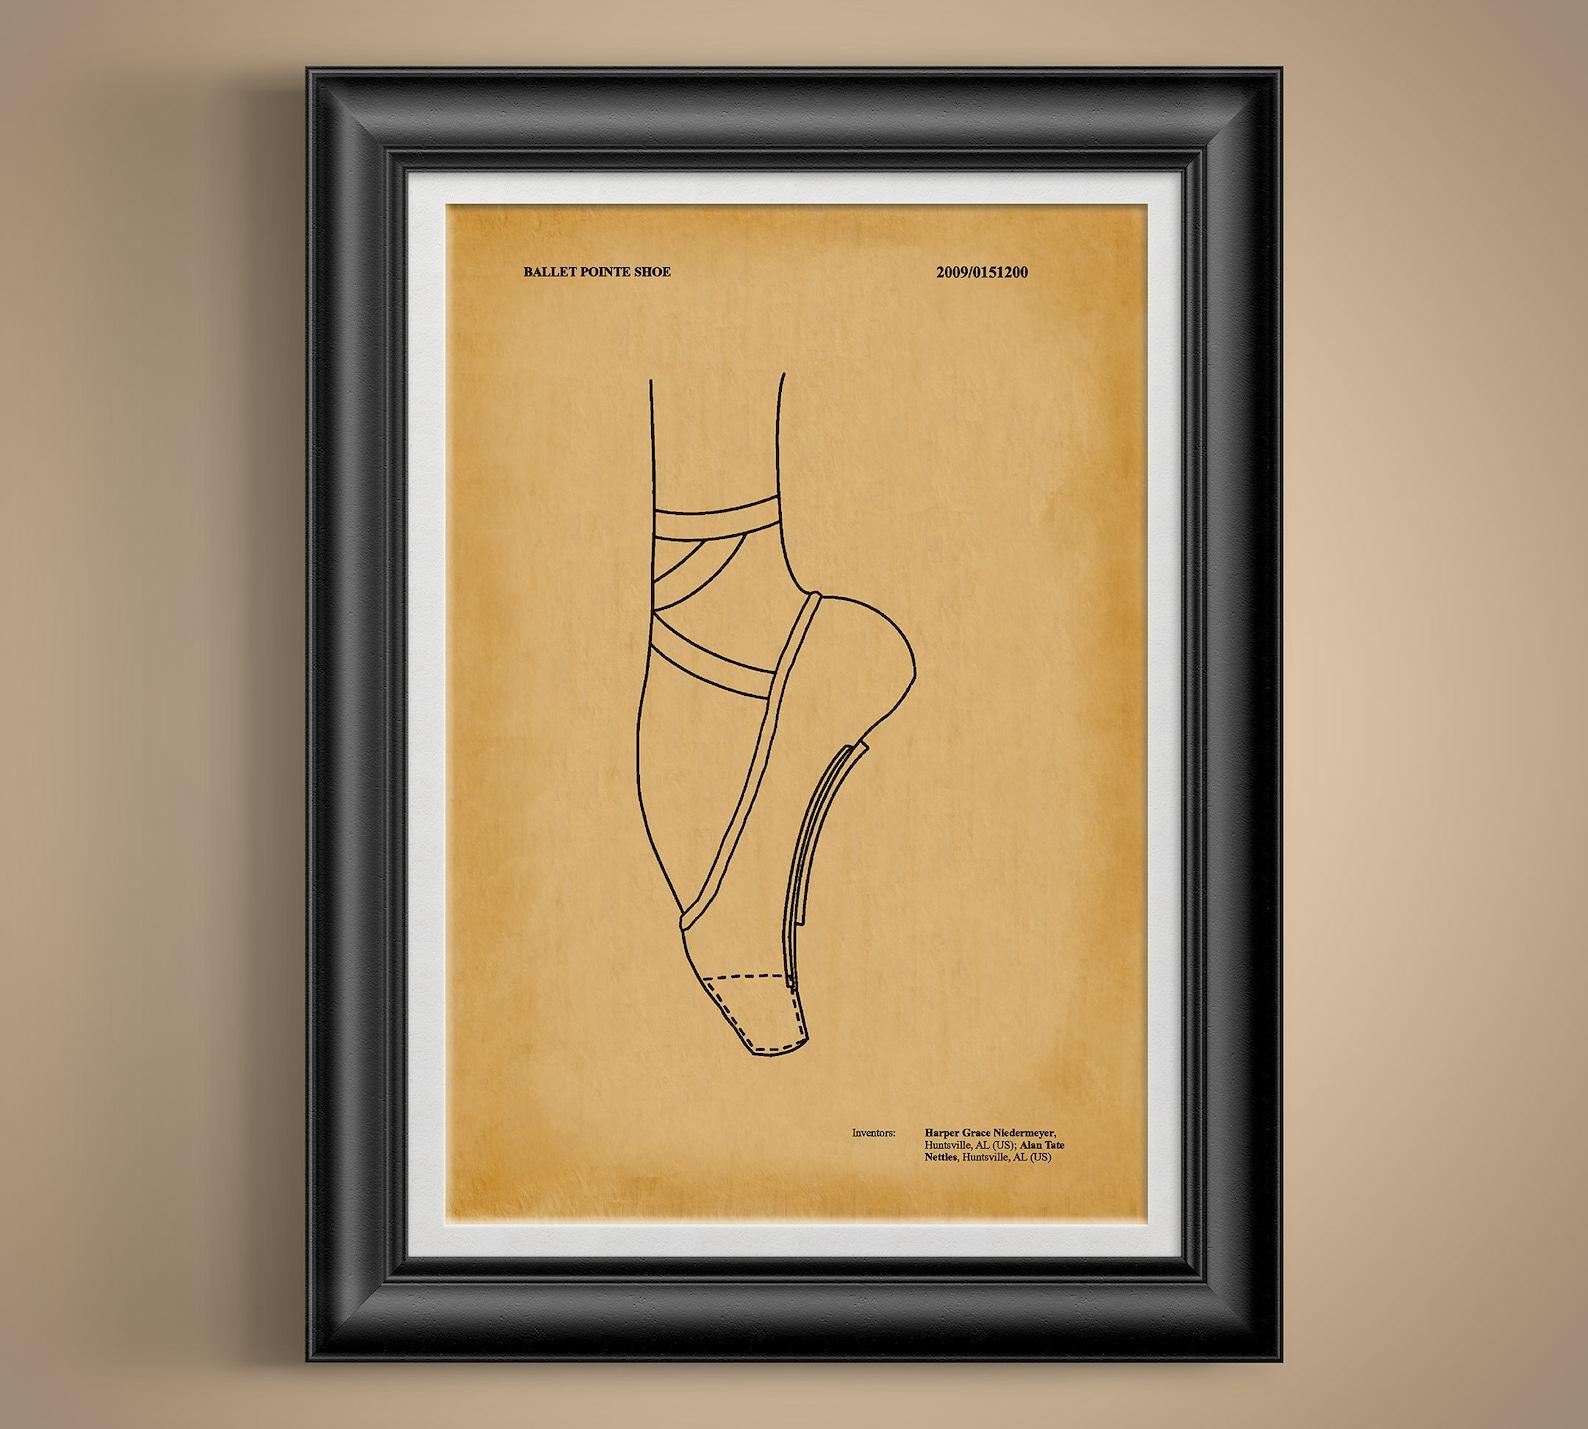 pointe shoes * ballerina gift * toe shoe * ballet shoes * design patent invention * dance studio * dance mom * ballet dancer gif